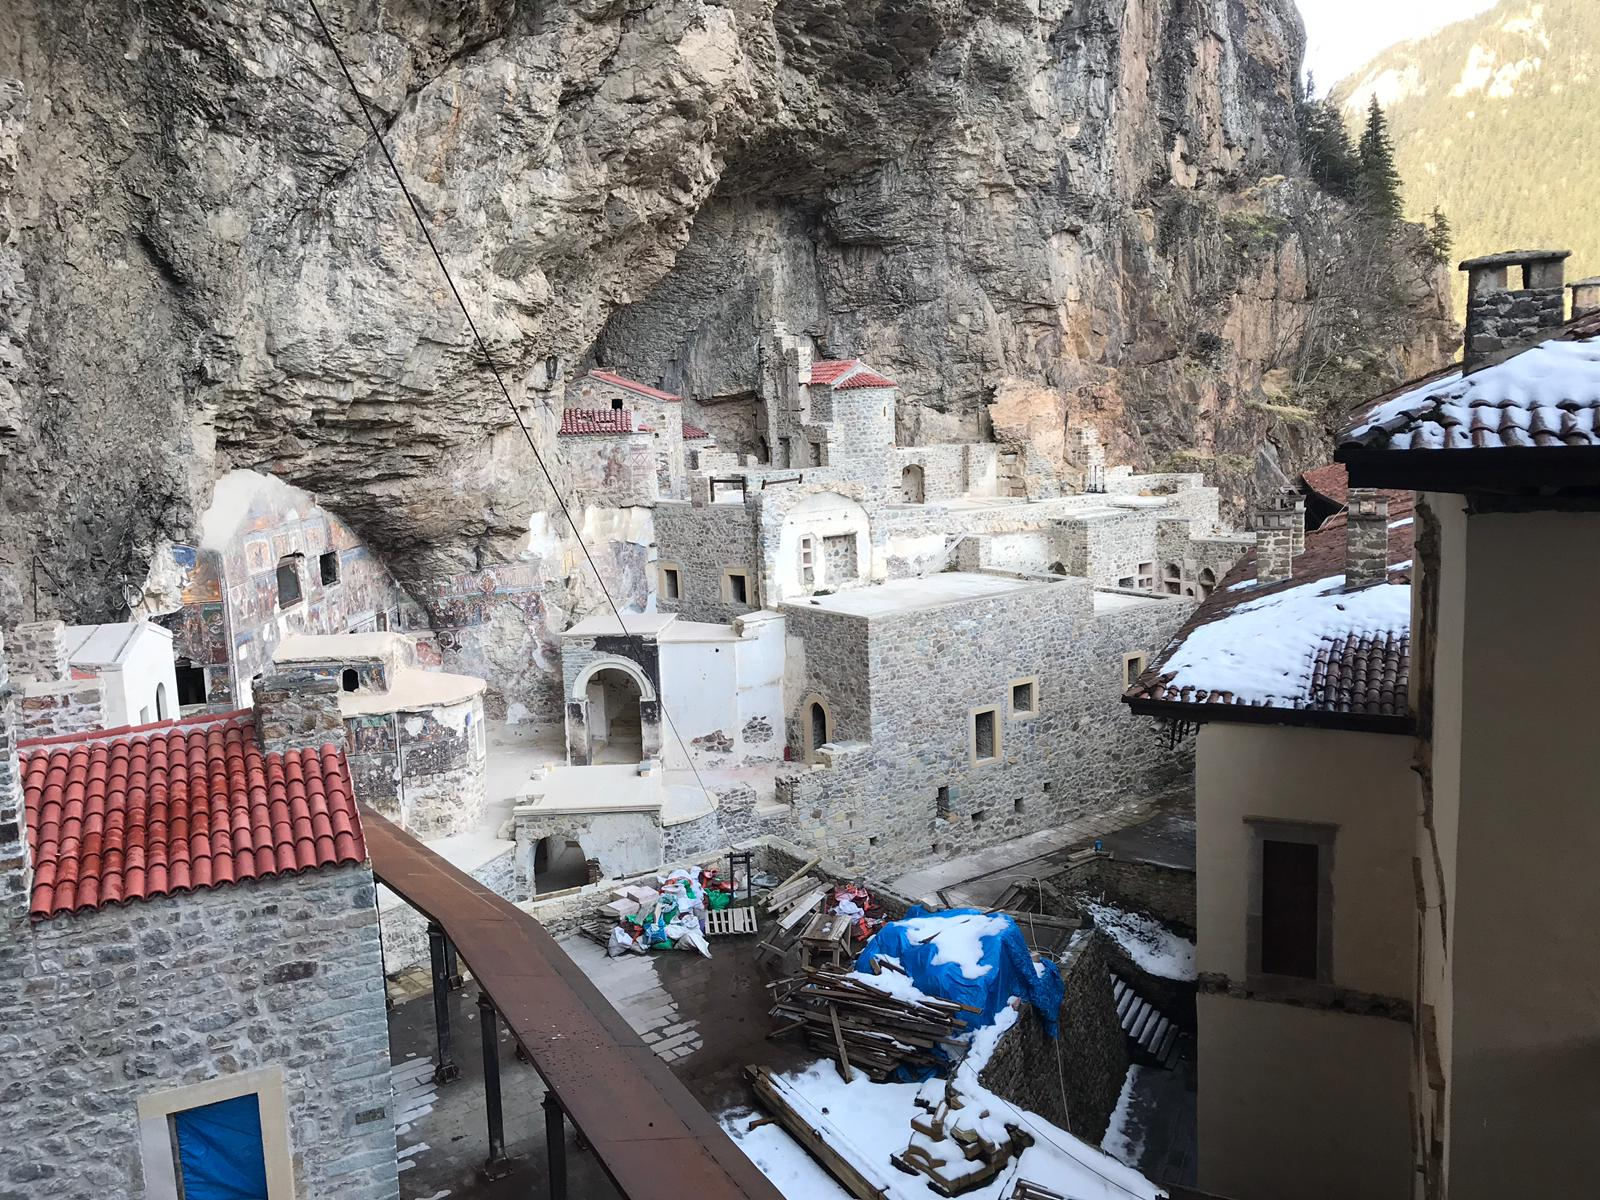 trabzonda-sumela-manastiri-ve-ayasofya-camii-yarin-ziyarete-aciliyor-6772-dhaphoto6.jpg